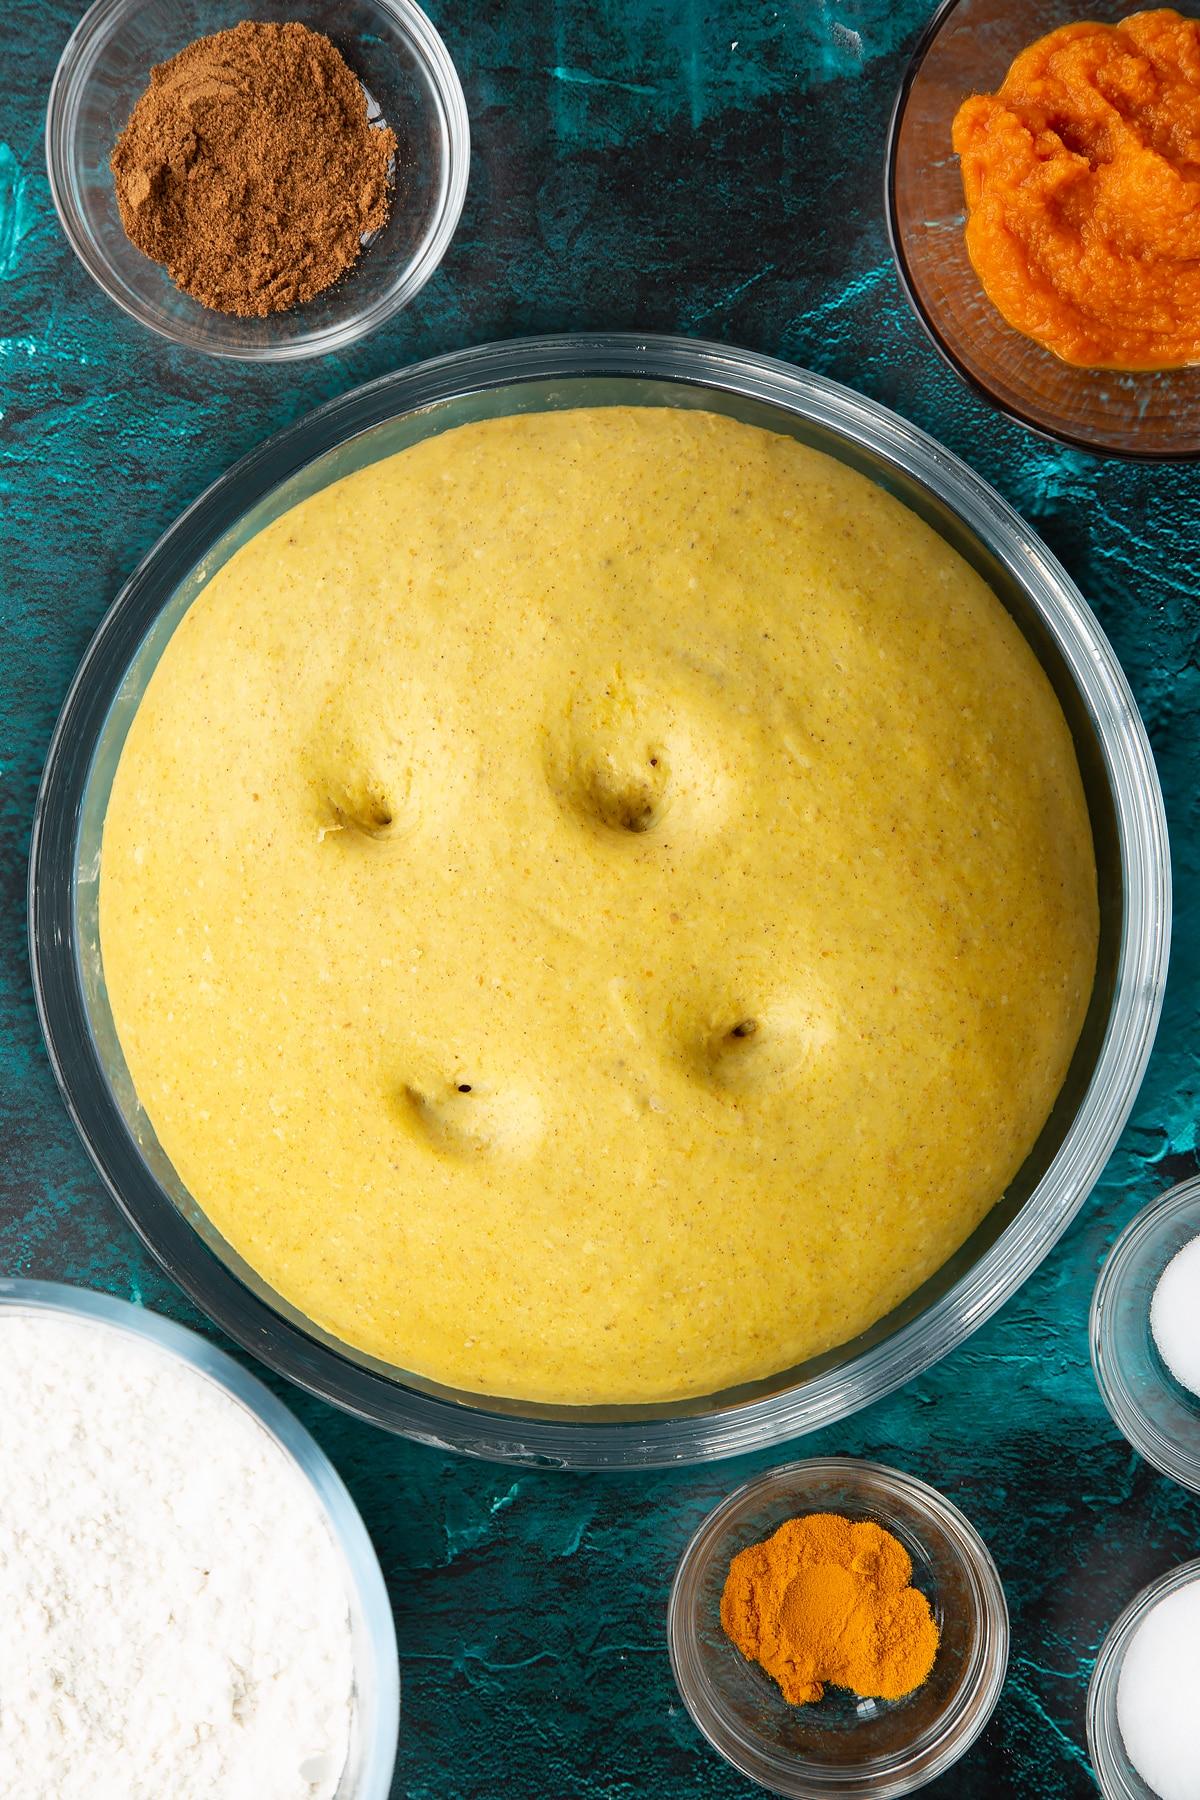 Risen pumpkin sourdough with four holes on top in a bowl. Ingredients to make pumpkin sourdough bread surround the bowl.